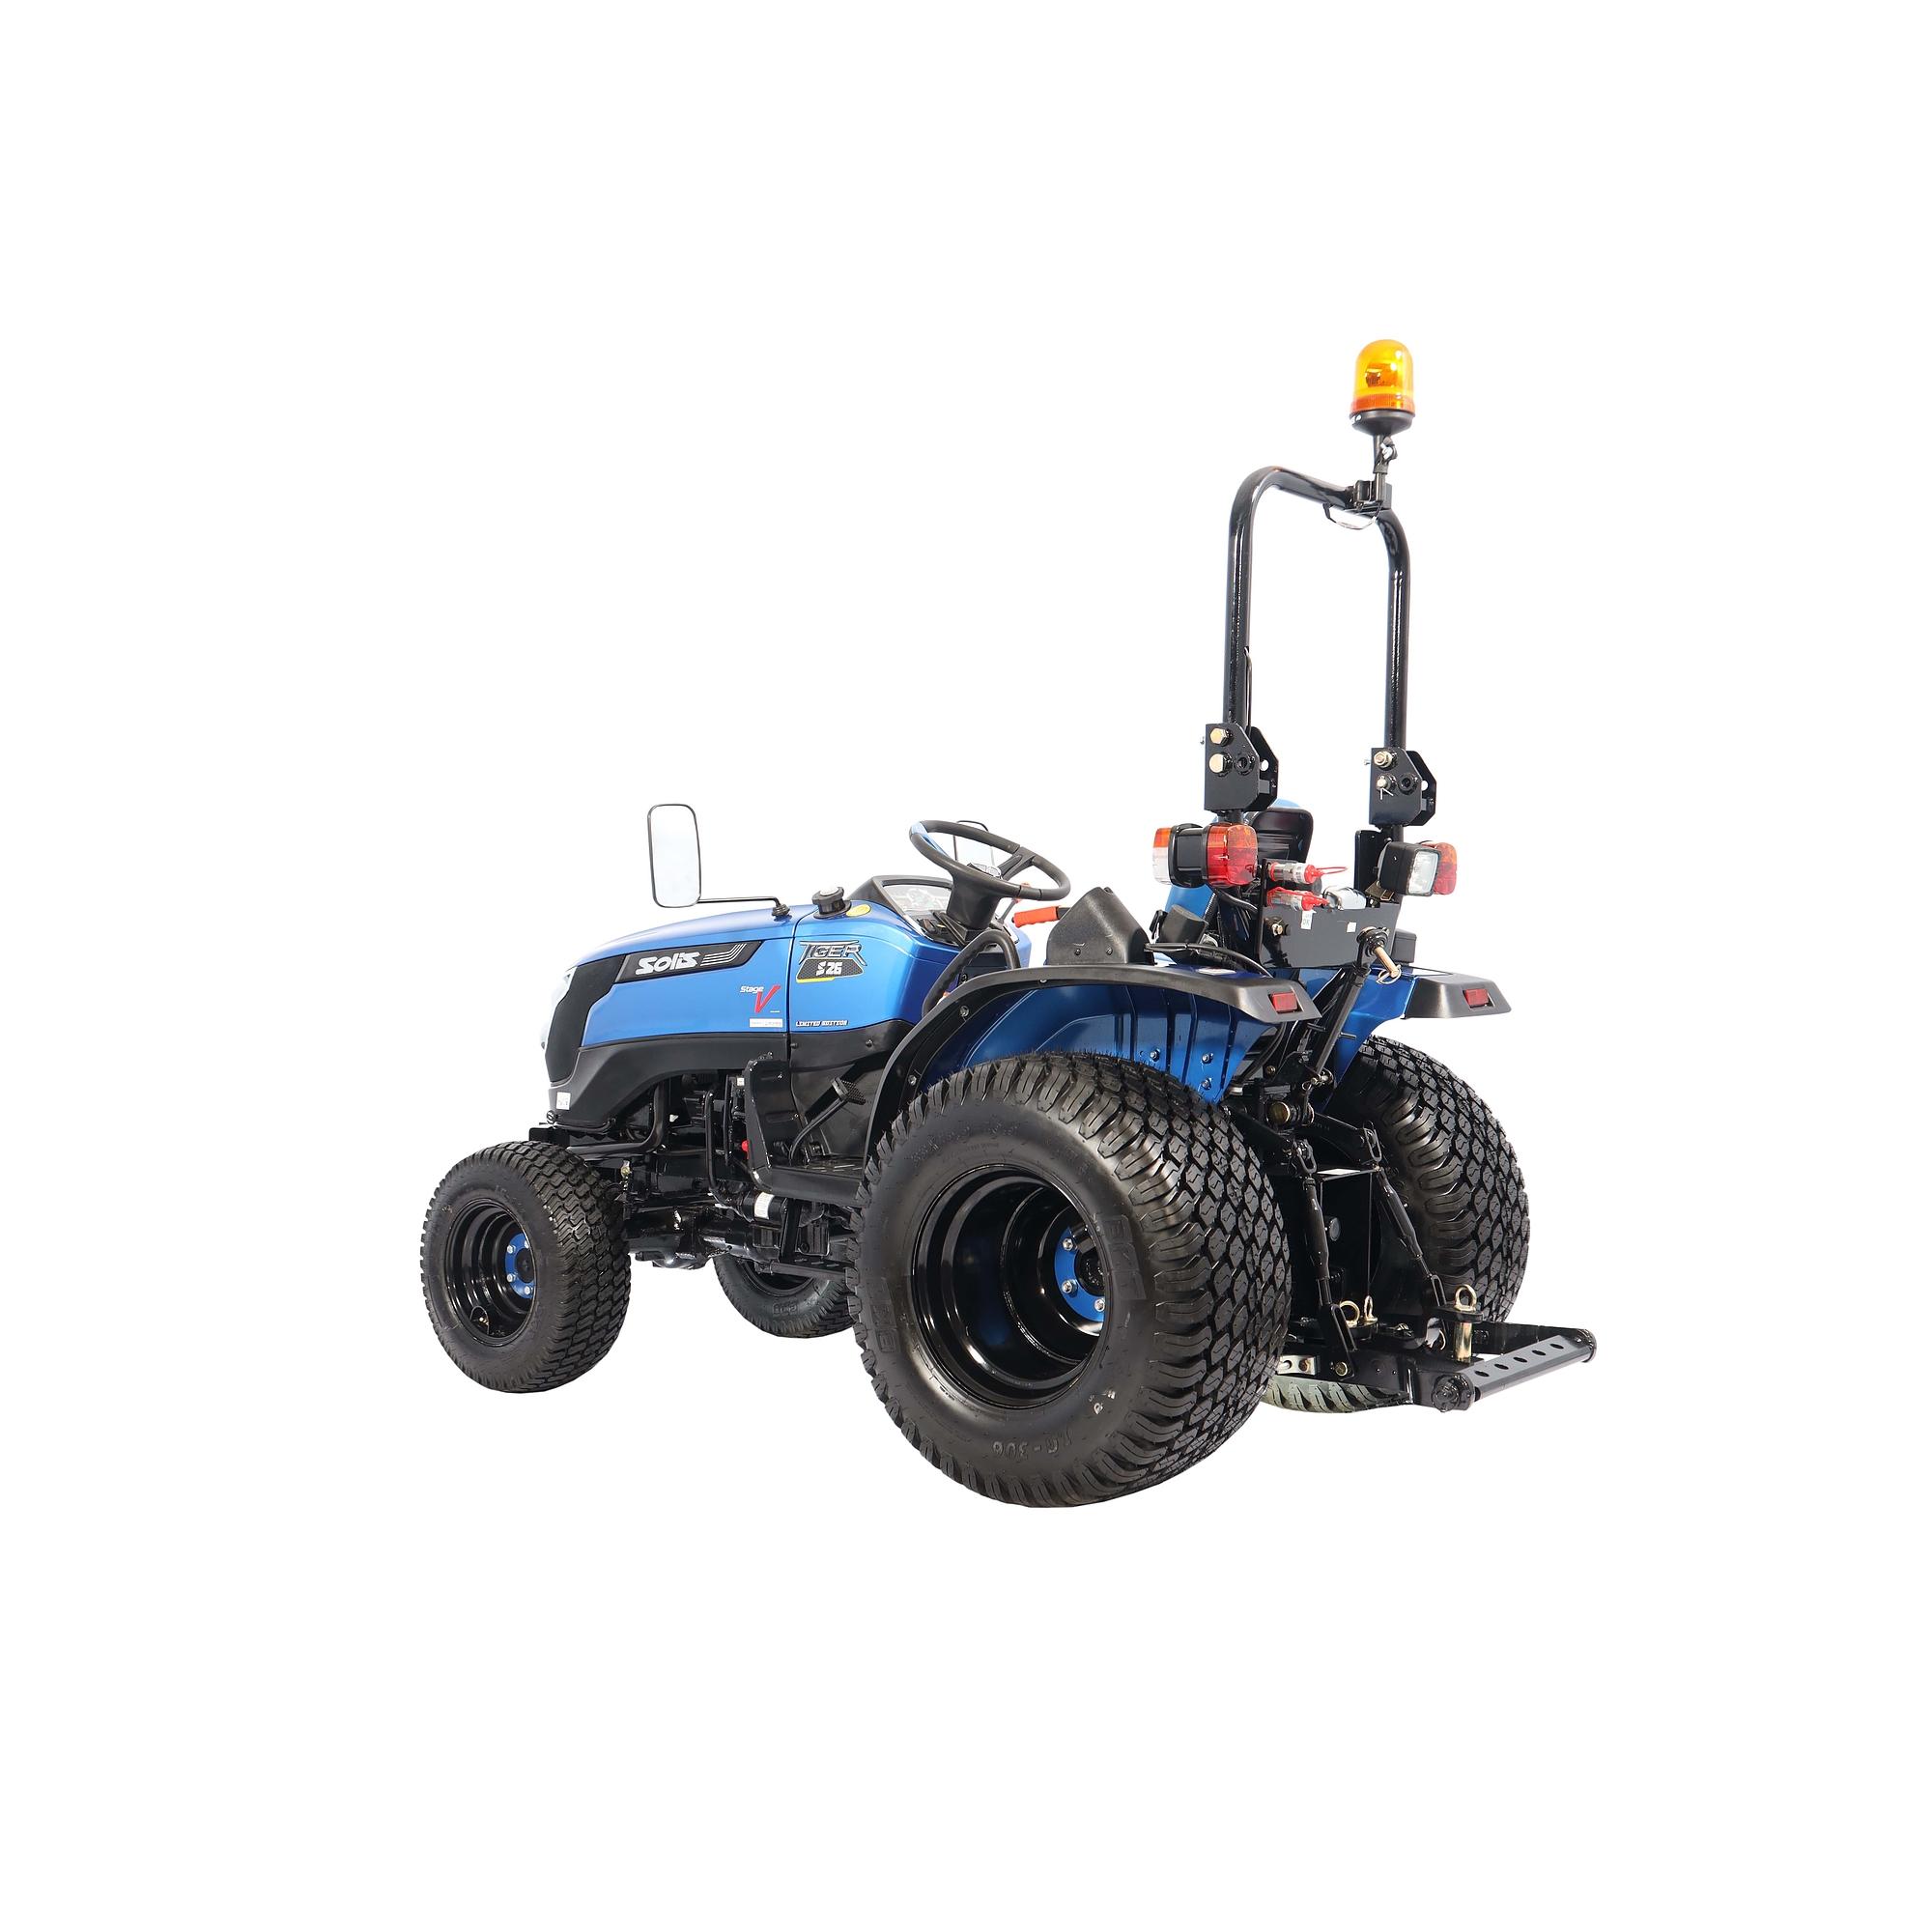 solis-26-limited-edition-traktor-5